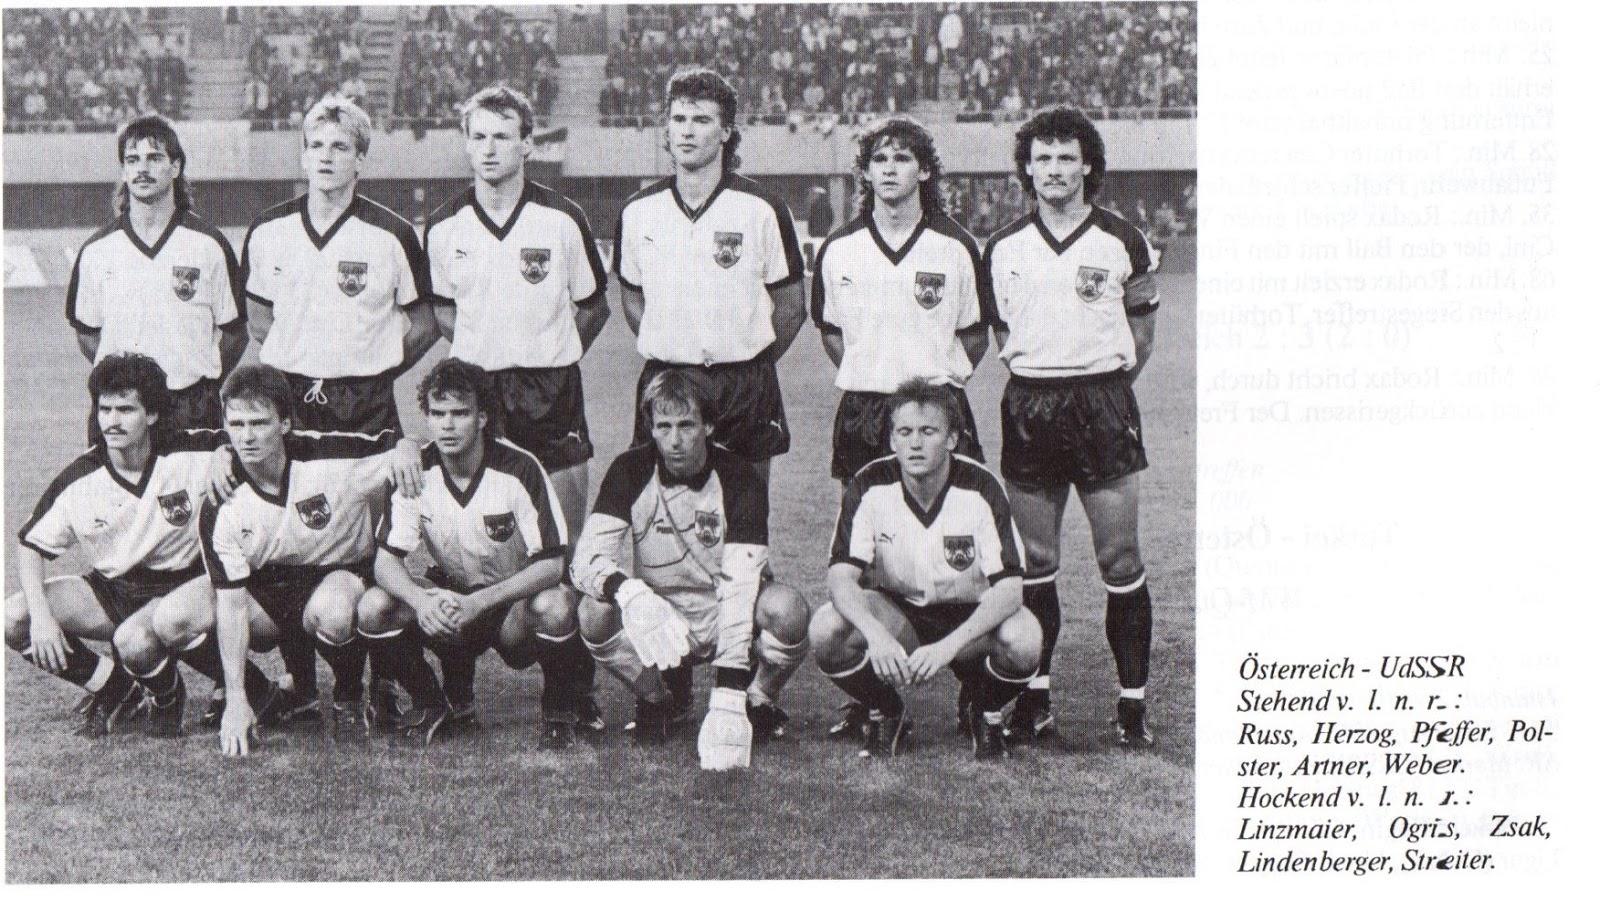 soccer nostalgia international season 1989 90, part 3  fu%c3%83%c2%9fball sweatshirts c 7 #5